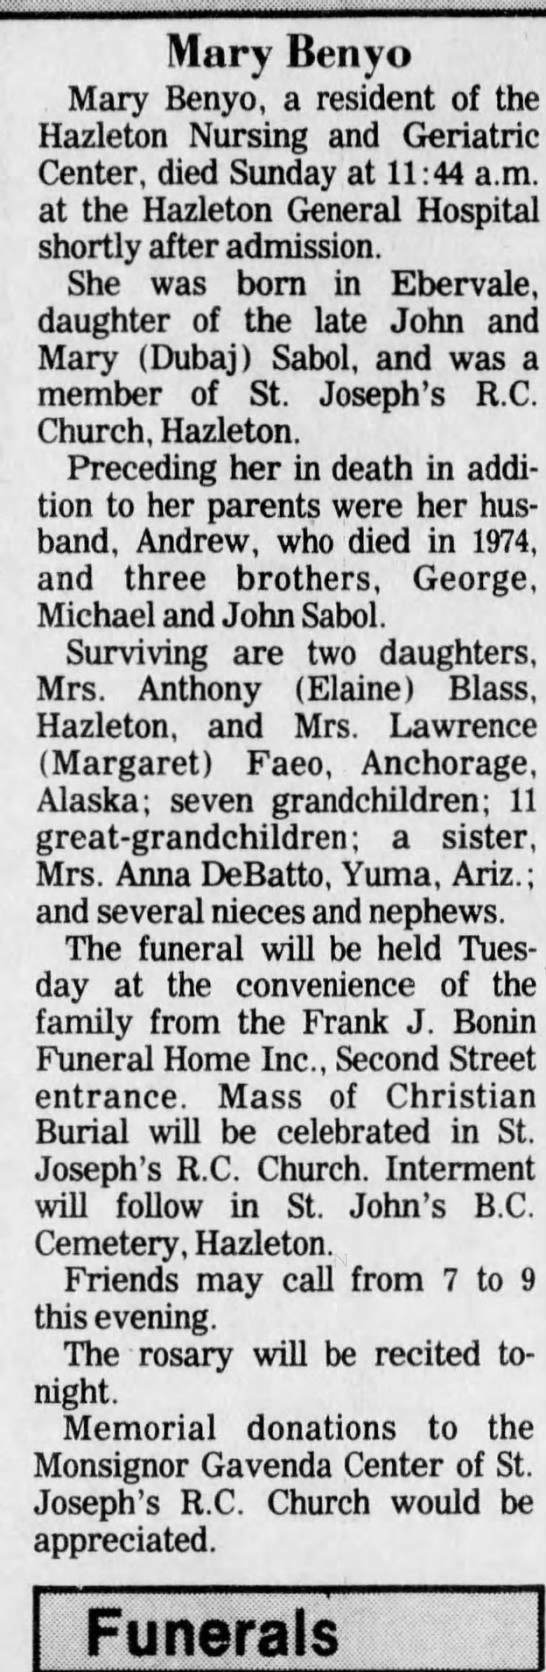 Anna DeBatto Yuma AZ 12 Jun 1989 -